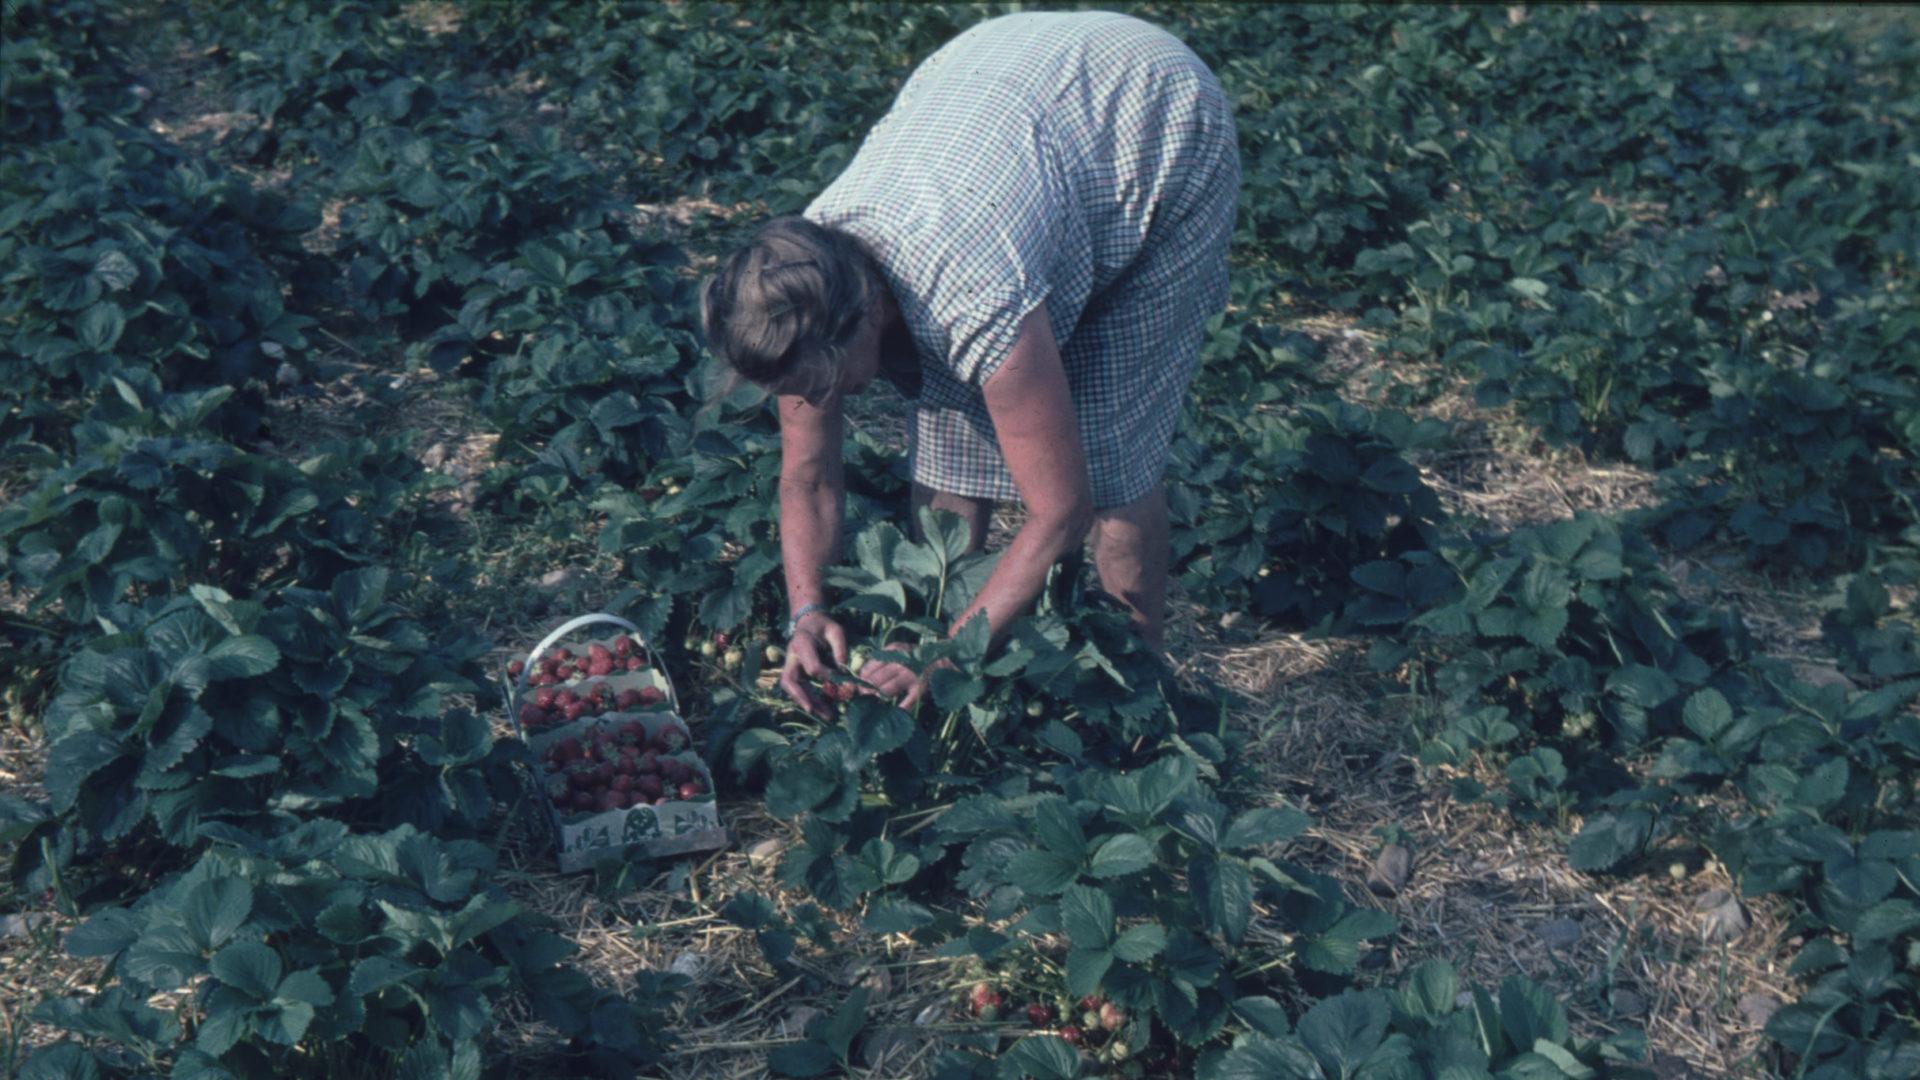 Alte Frau am Erdbeeren Pflücken